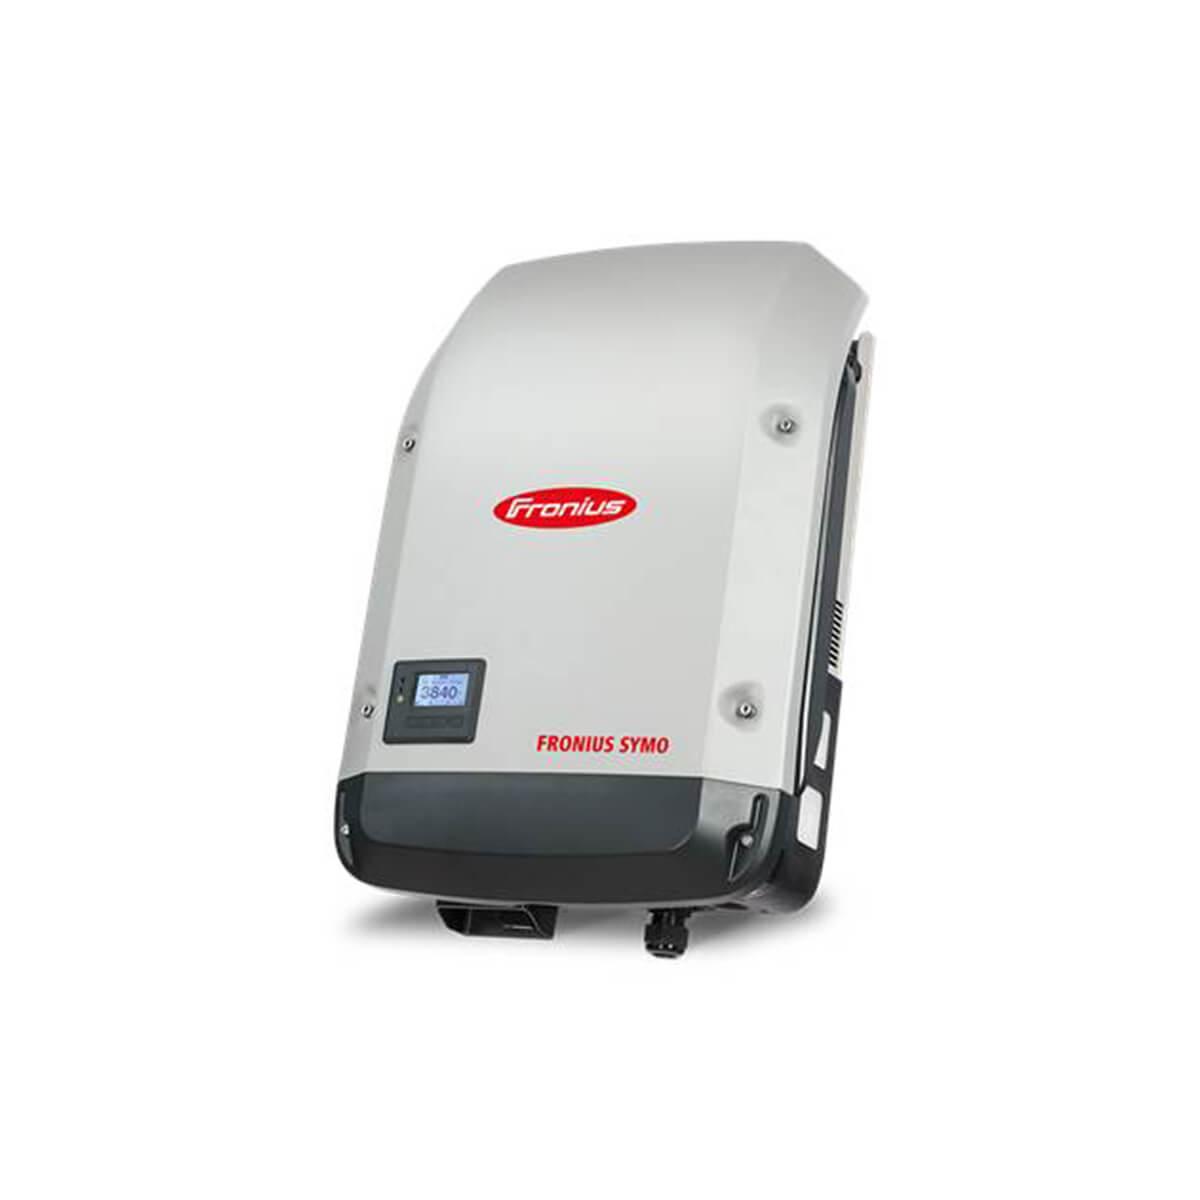 fronius 17.5kW inverter, fronius symo 17.5kW inverter, fronius symo 17.5-3-m inverter, fronius symo 17.5-3-m, fronius symo 17.5 kW, FRONIUS 17.5 KW